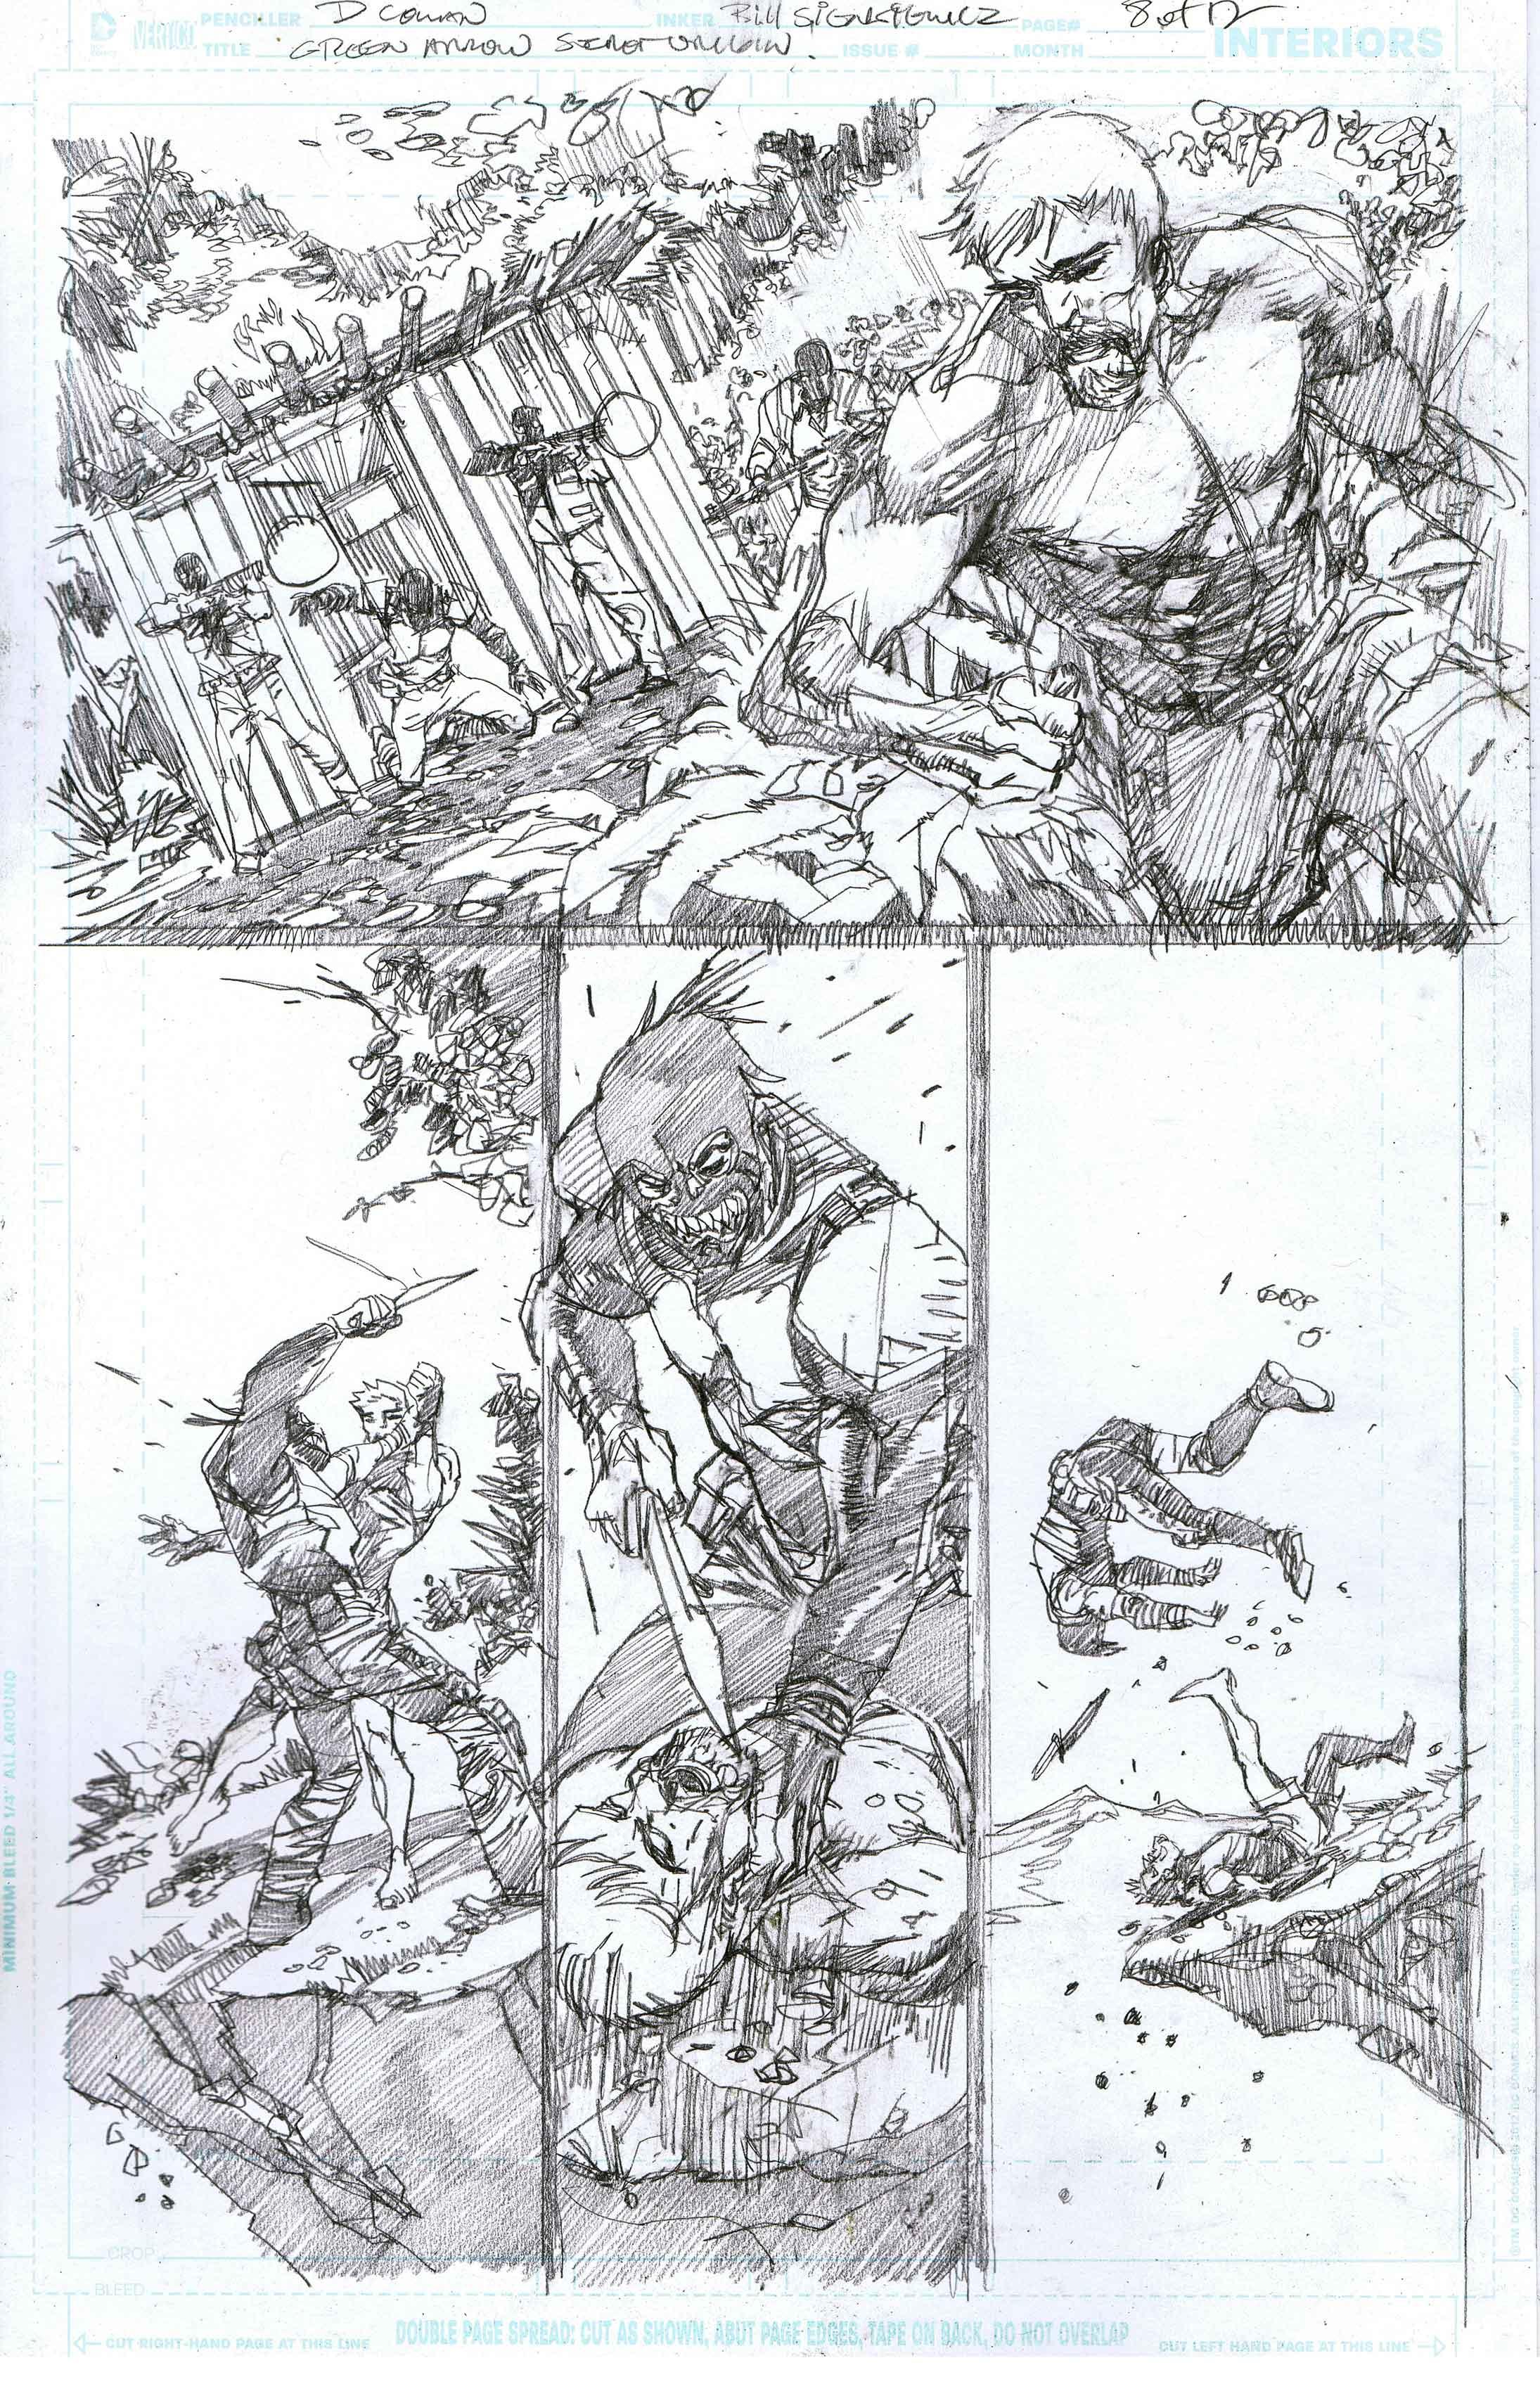 Green Arrow: Secret Origins - Page 8 - Pencils